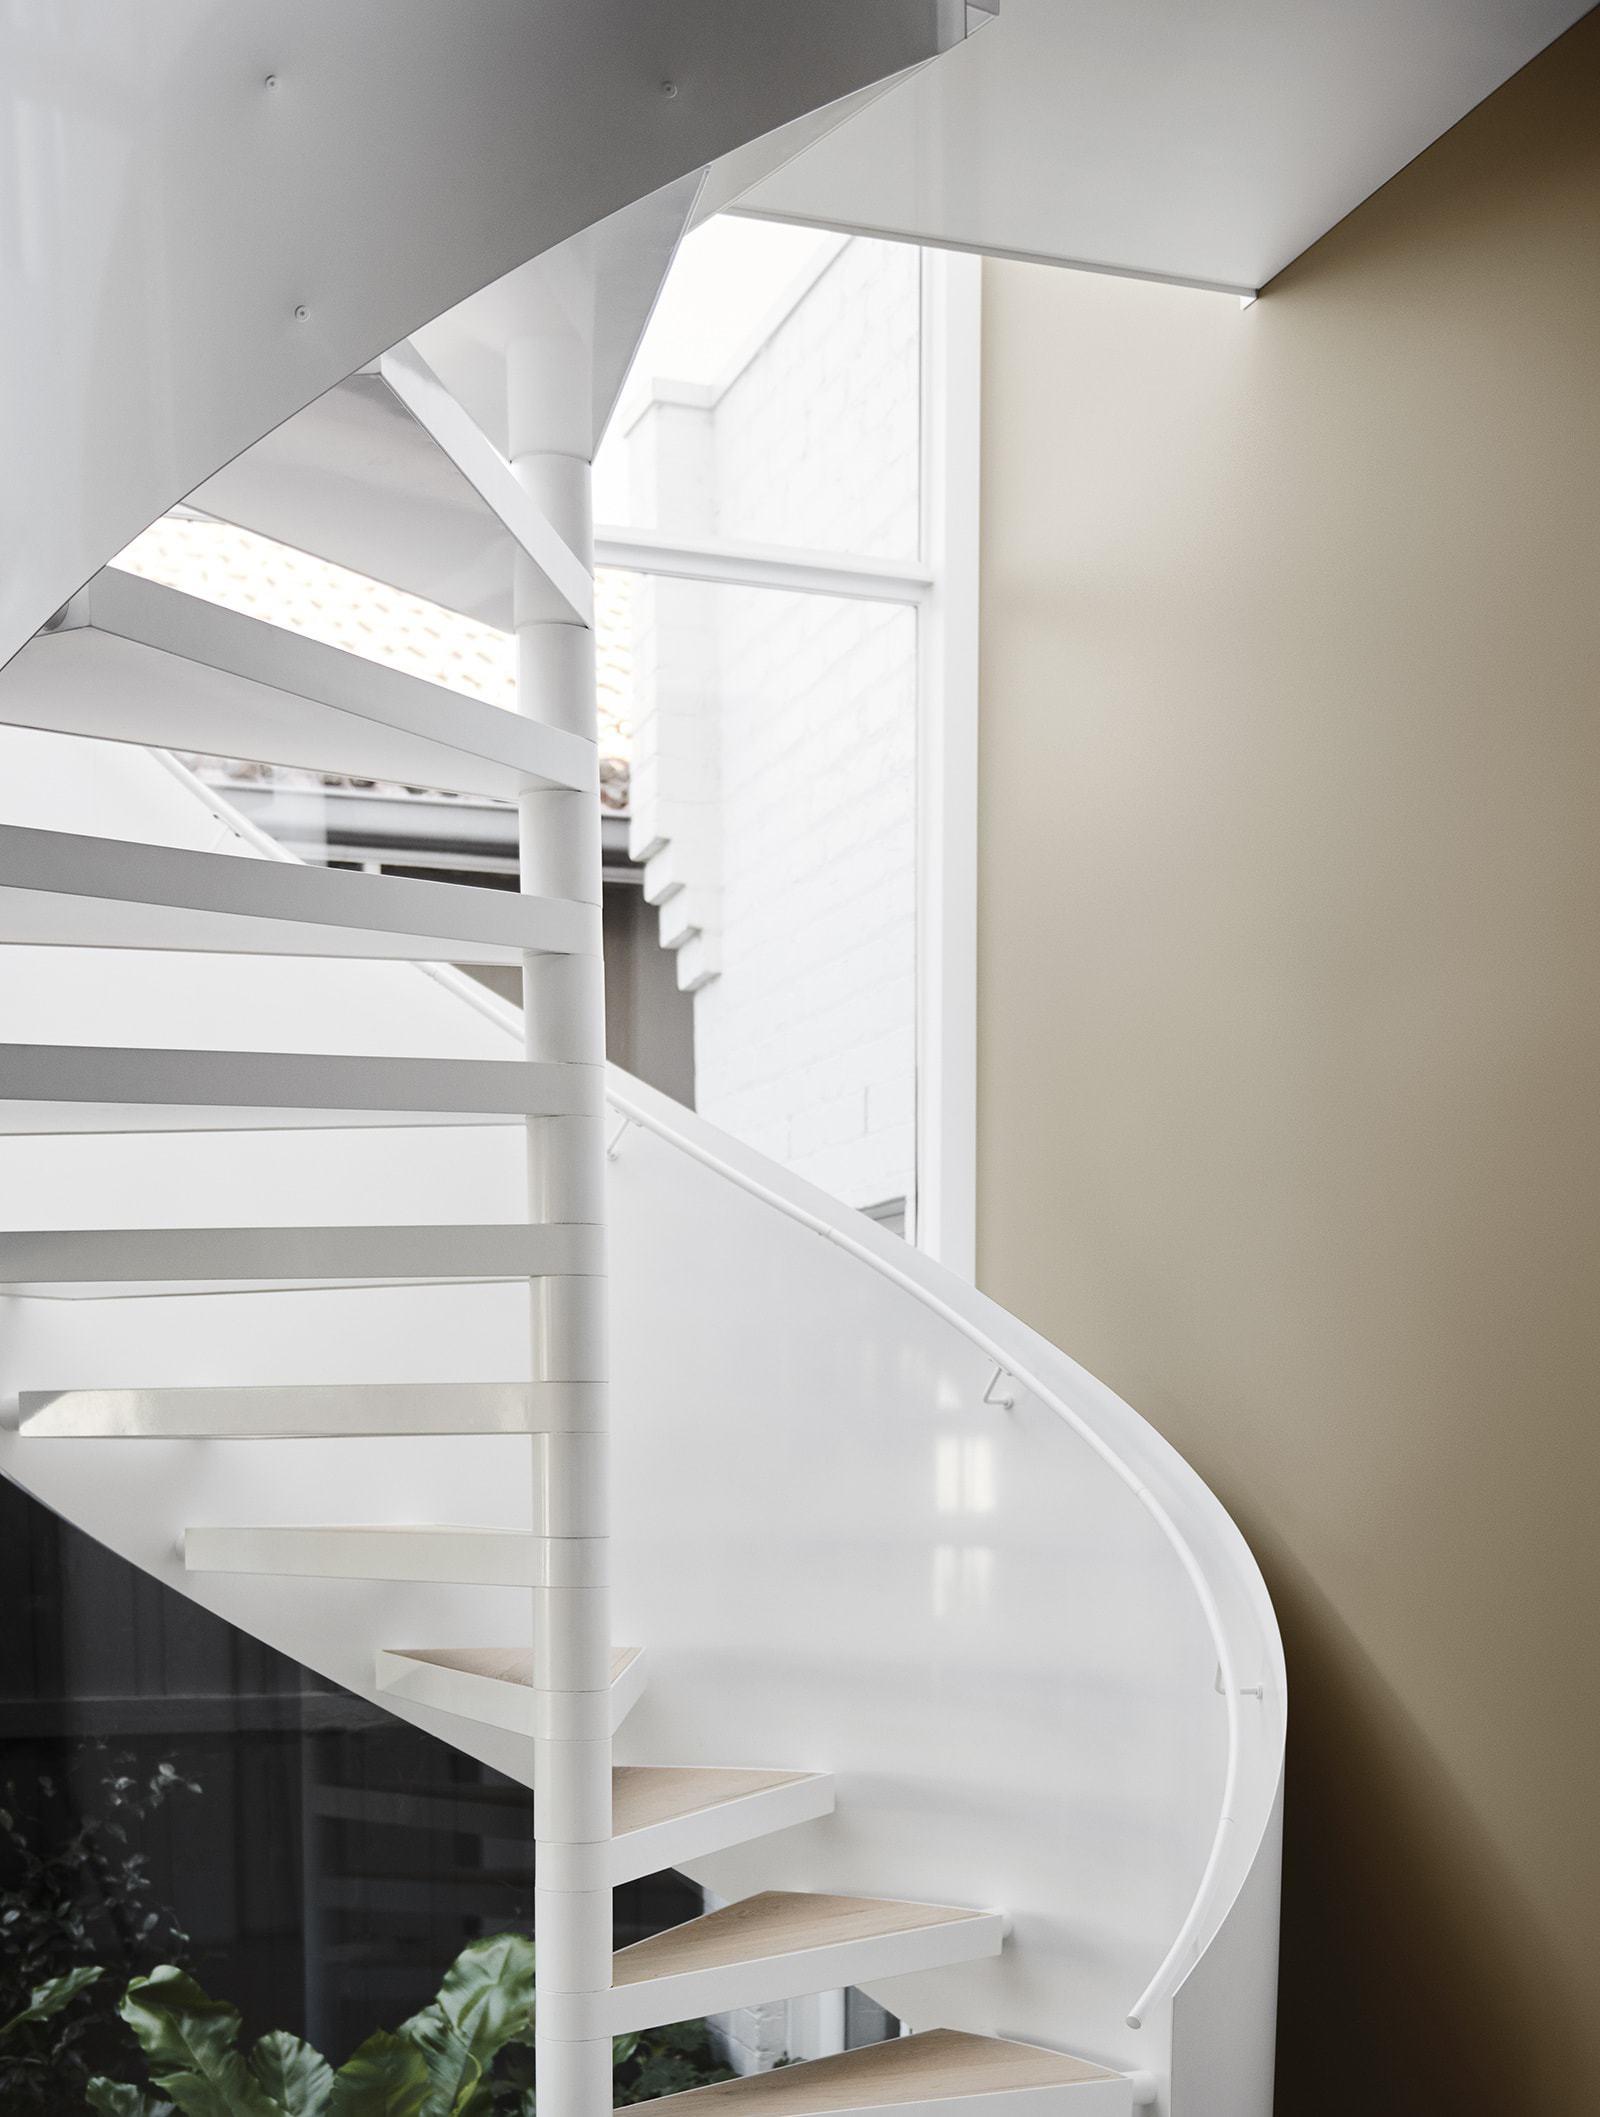 neutral interior design scheme white staircase against muddy terracotta wall paint